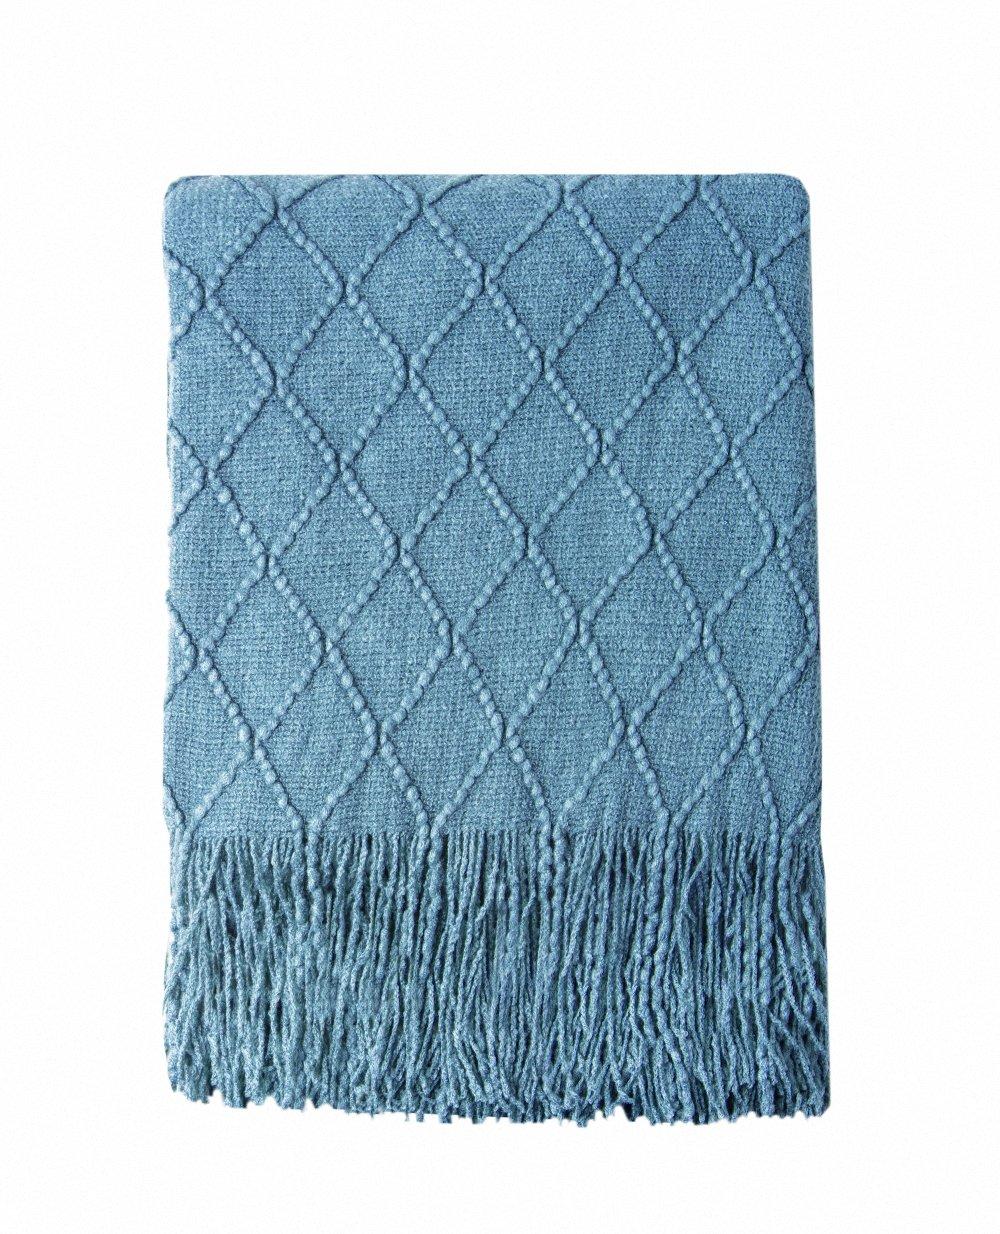 "BOURINA Throw, 50""x60"", Blue"